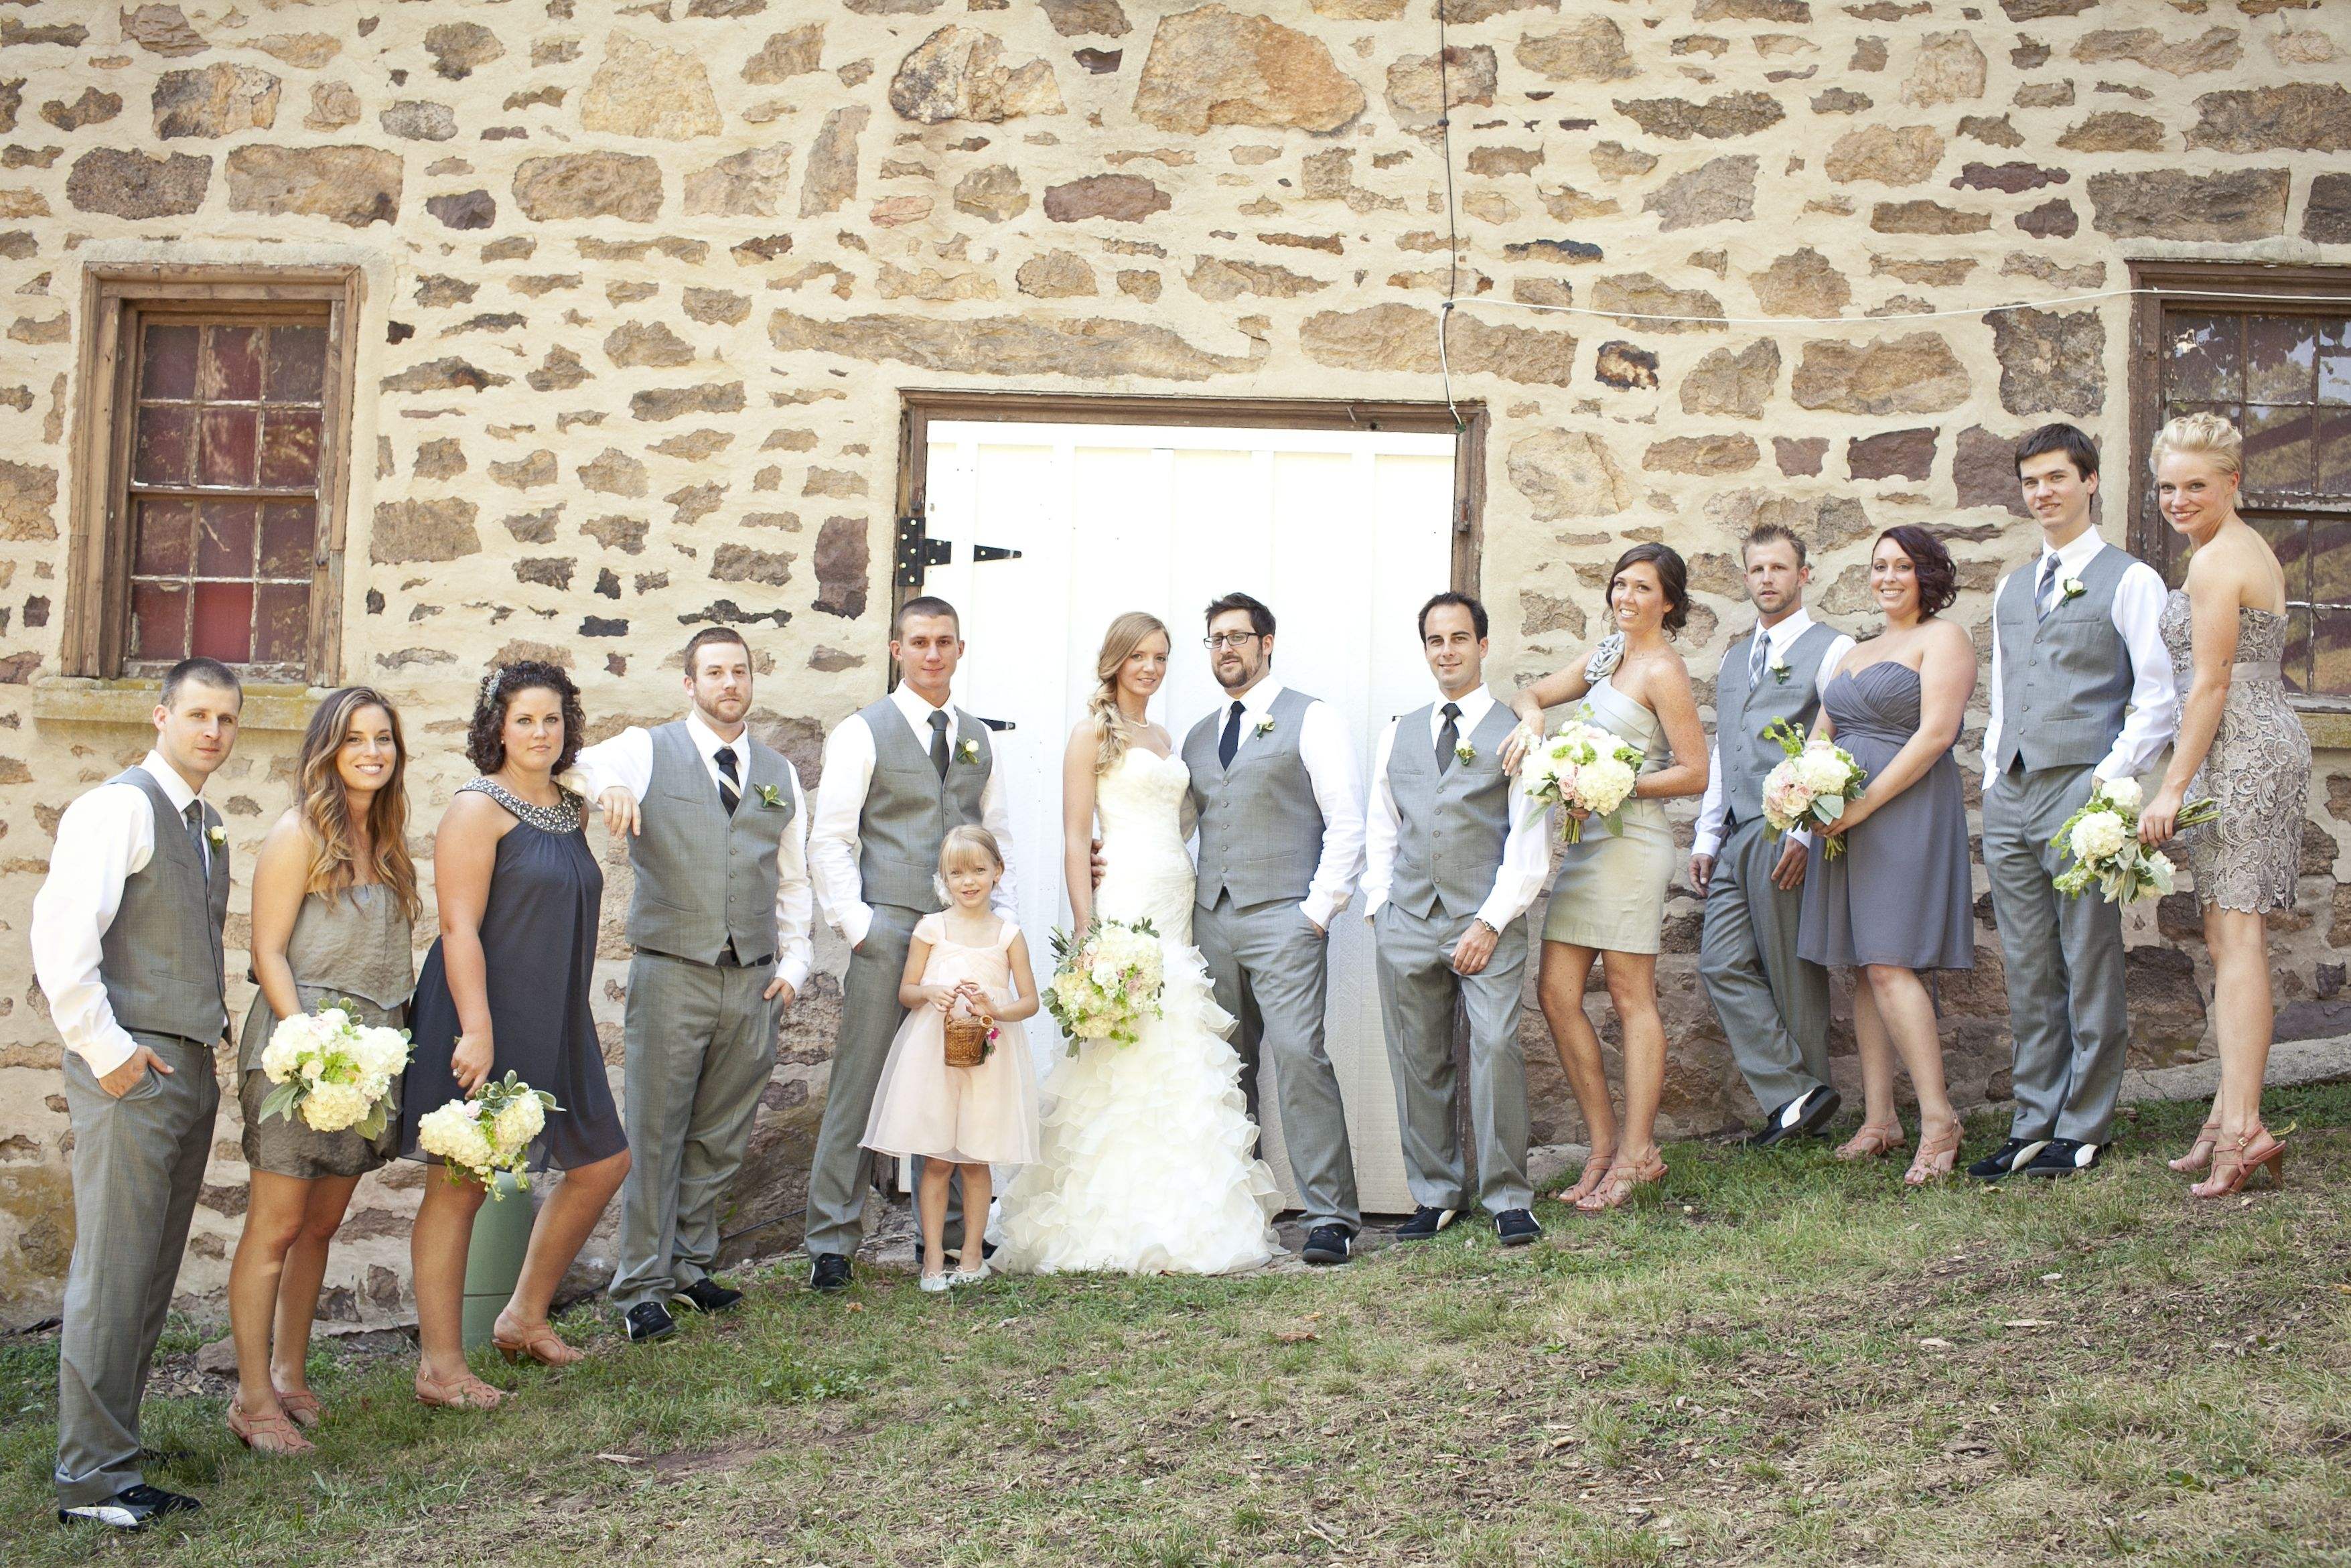 stone barn and grey wedding party | my wedding | Pinterest | Stone ...